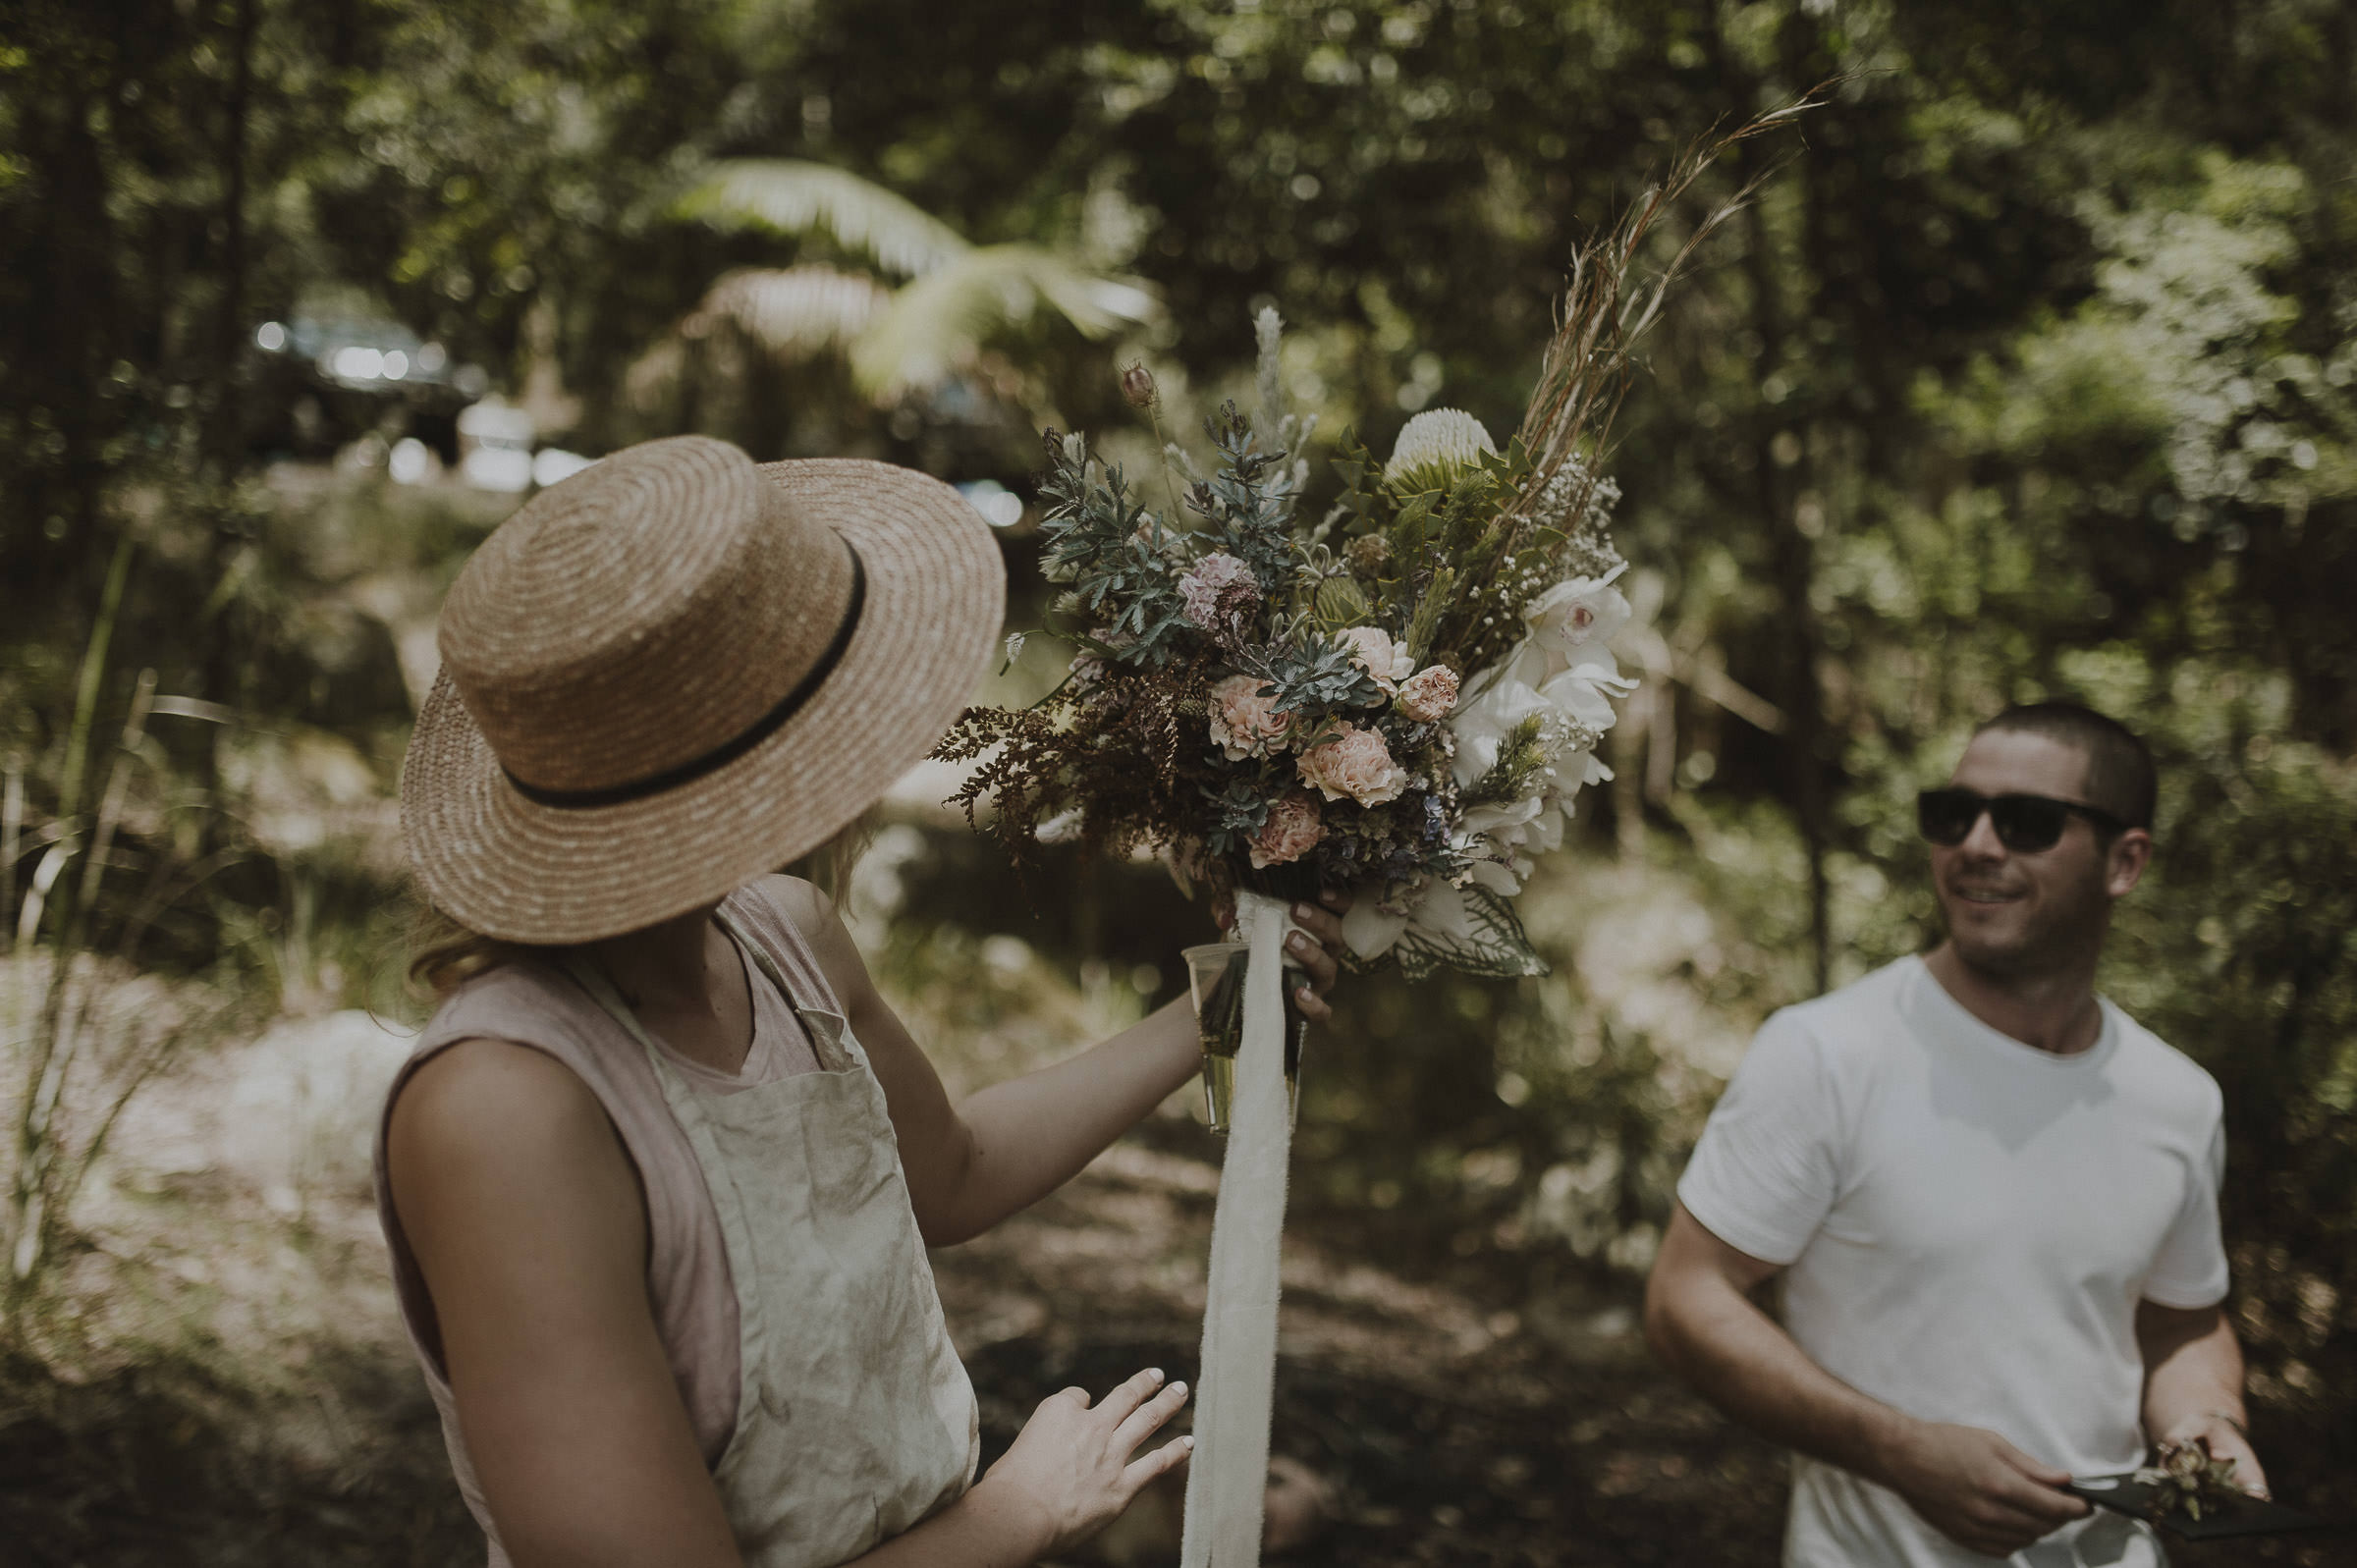 Film & Foliage - Florist & StylistEmail - filmandfoliage@gmail.com Phone - 0421 853 295